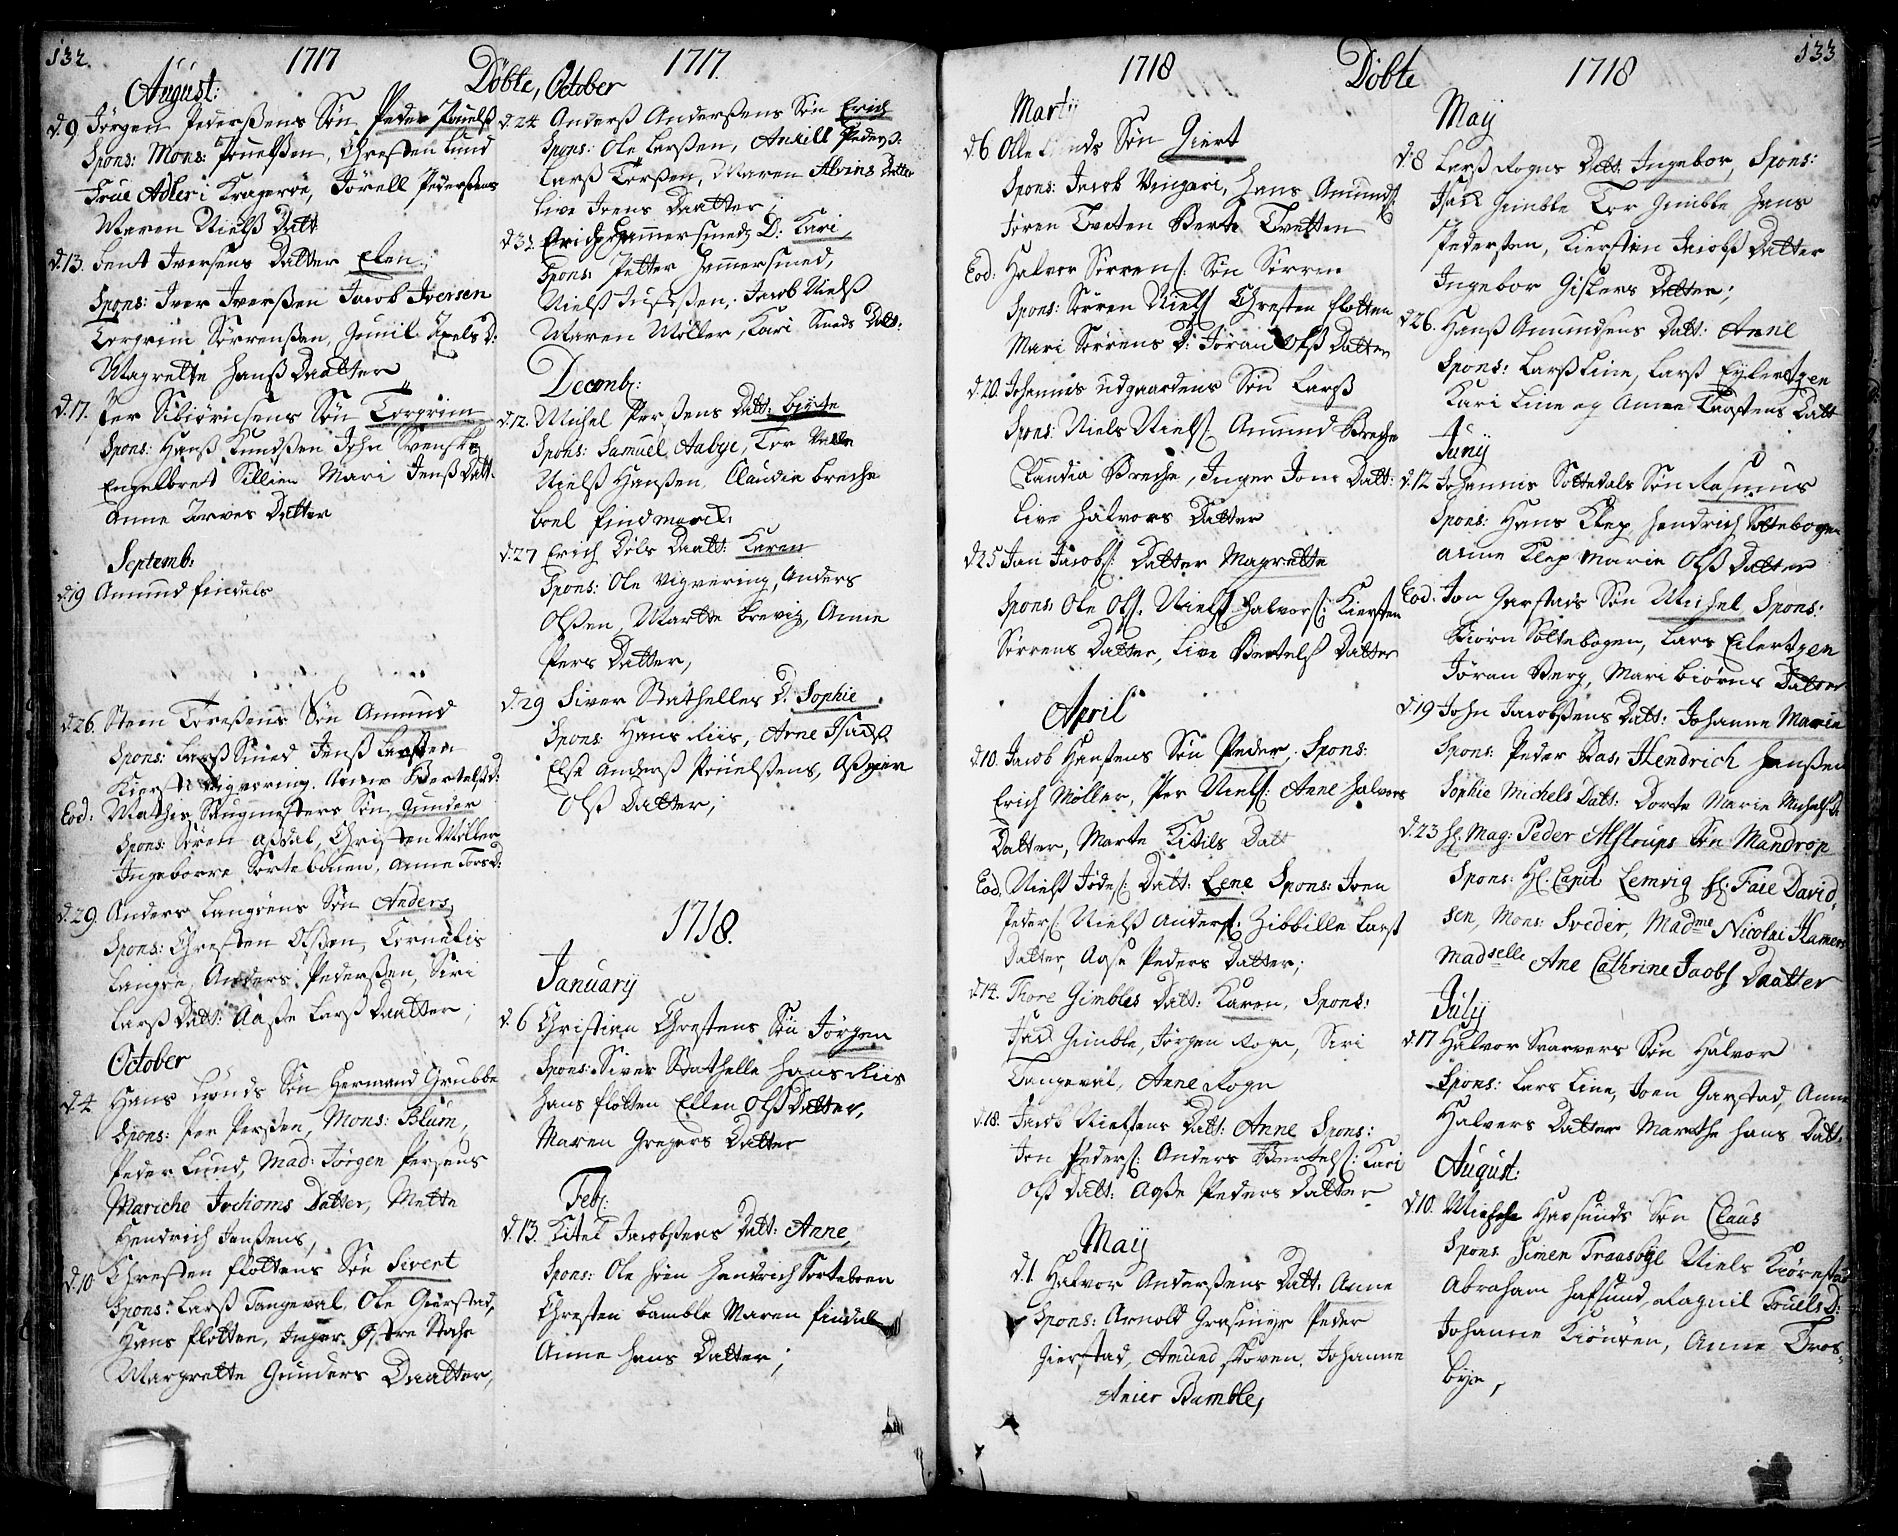 SAKO, Bamble kirkebøker, F/Fa/L0001: Ministerialbok nr. I 1, 1702-1774, s. 132-133